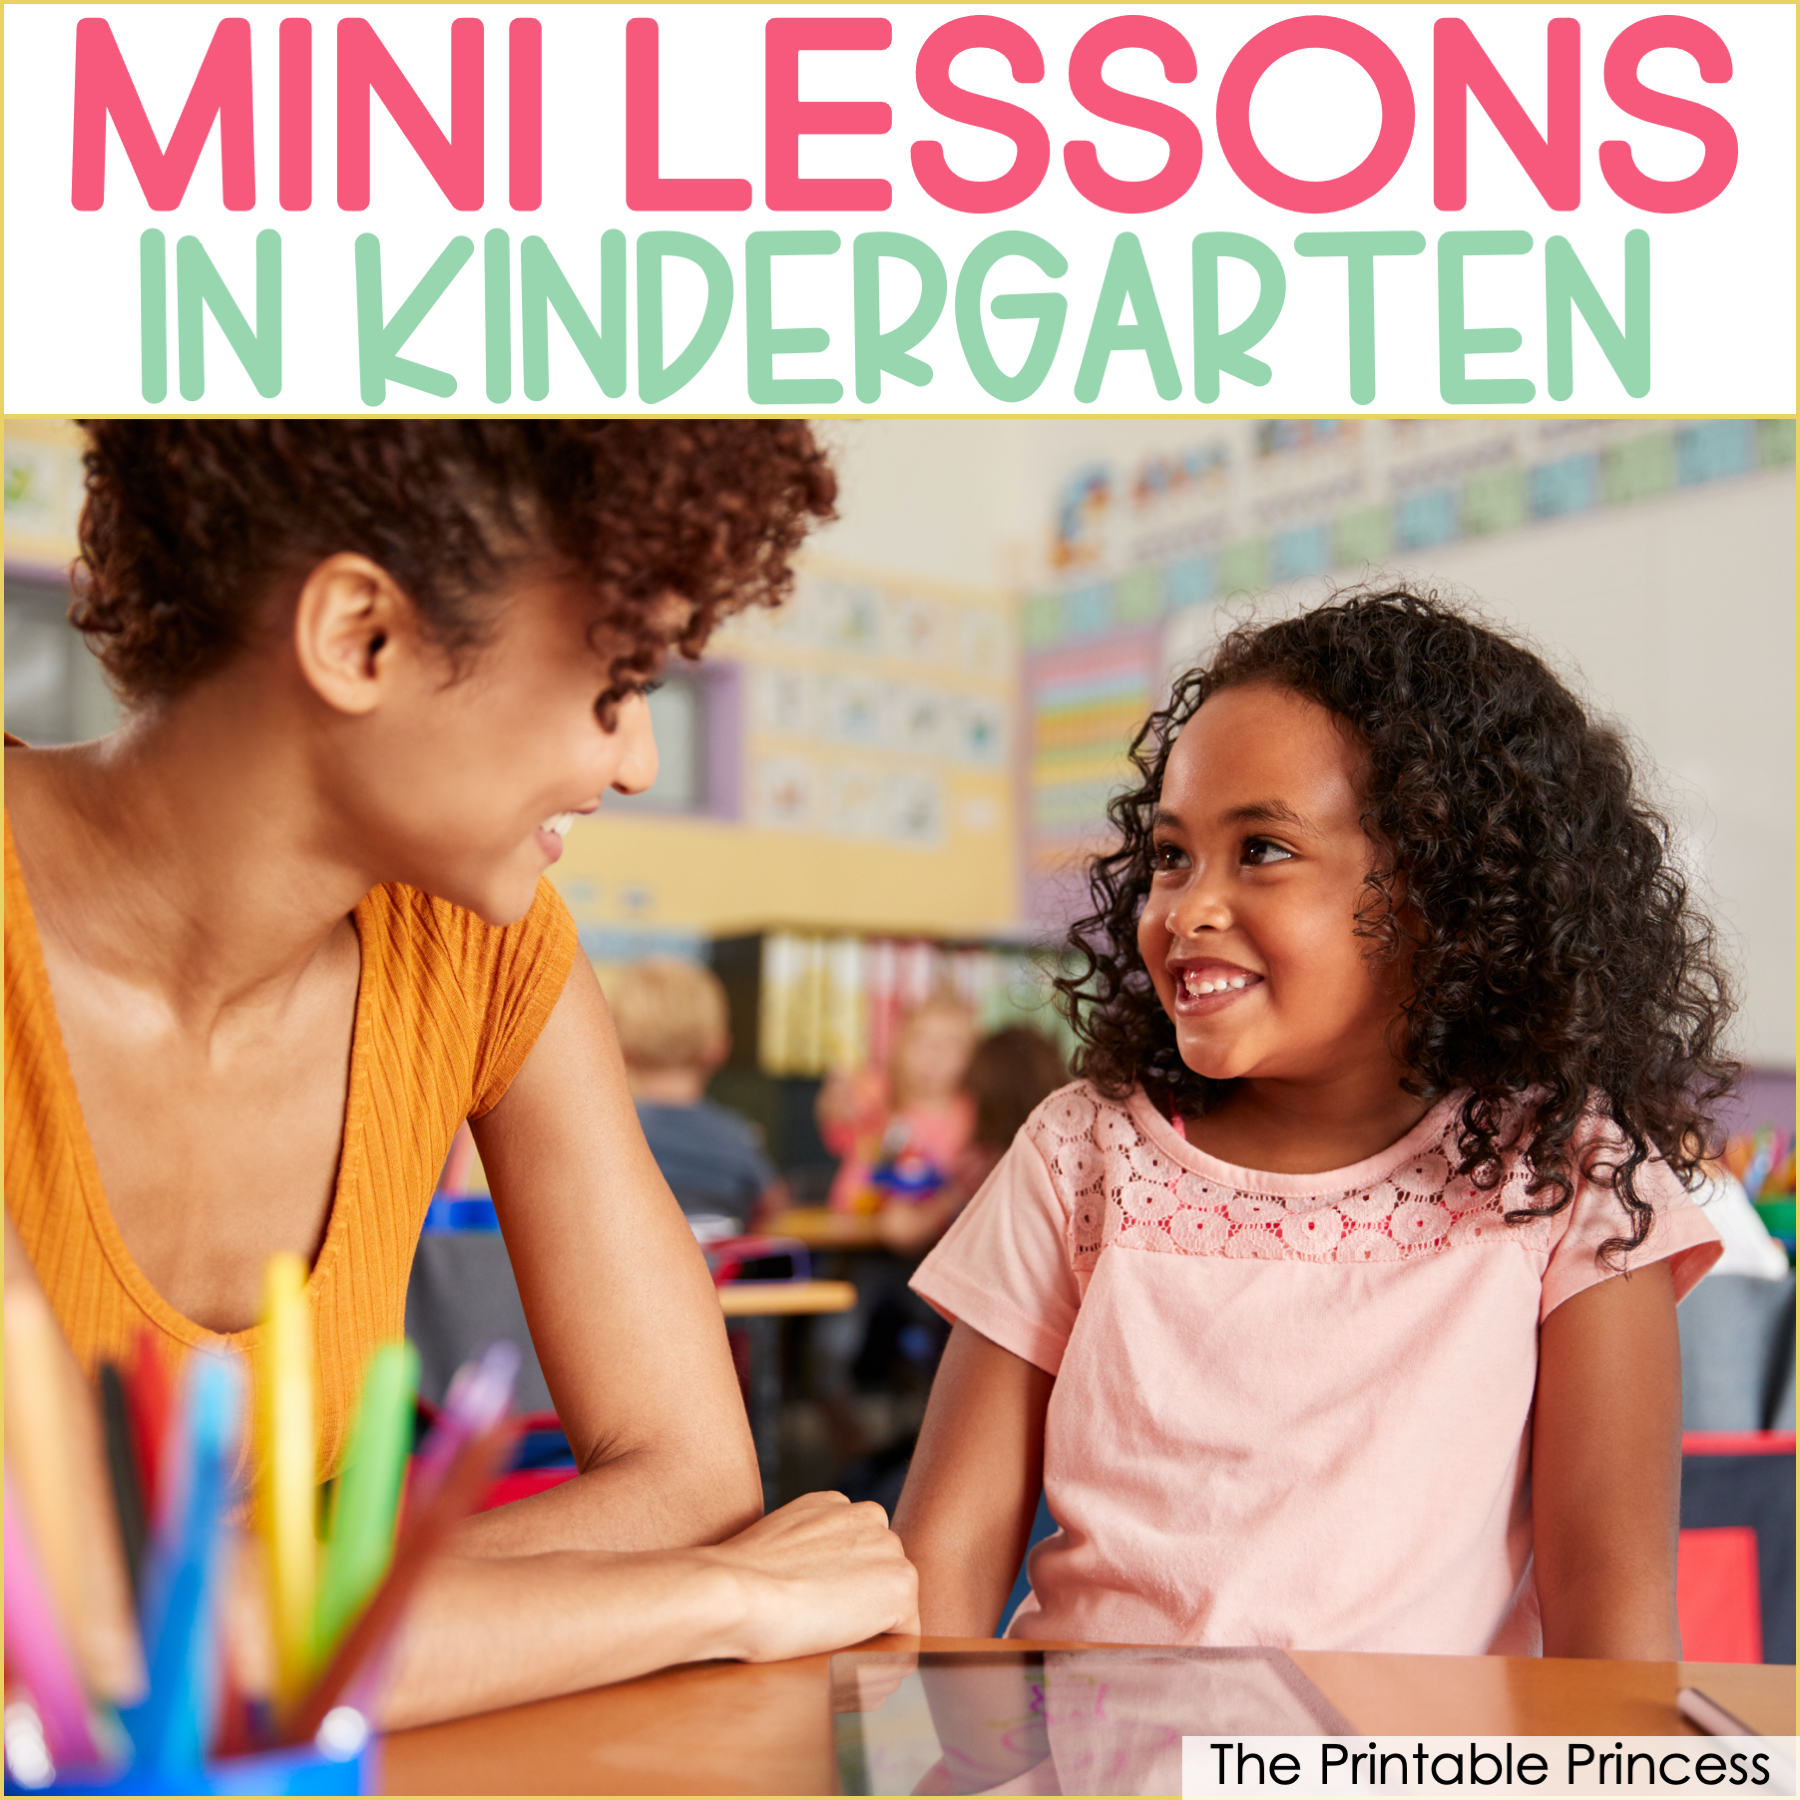 Benefits of Using Mini Lessons in Kindergarten